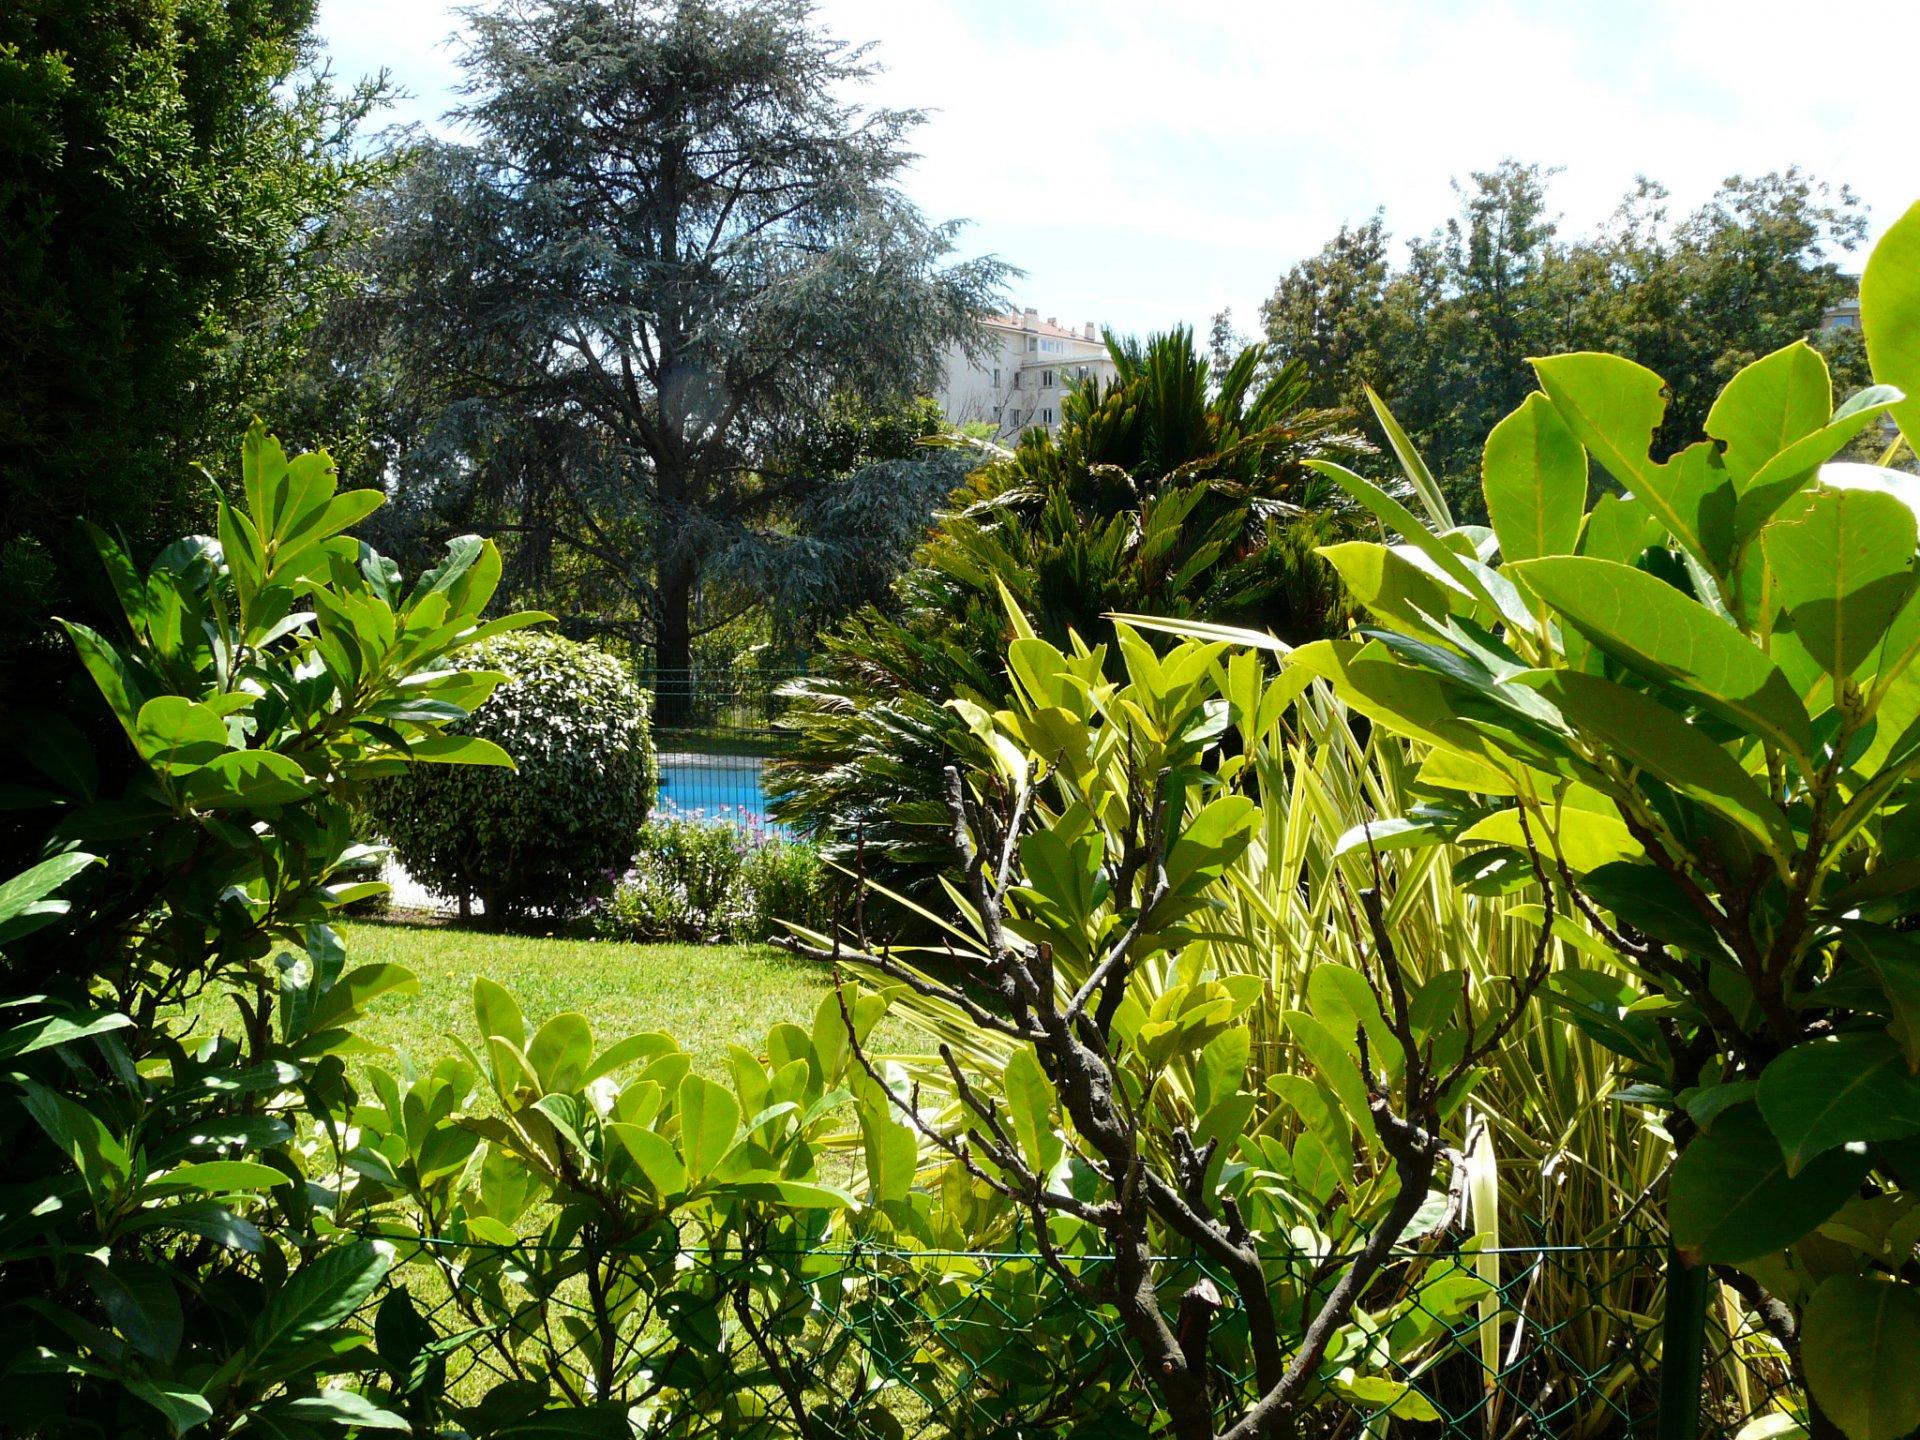 garden next to the swimming pool